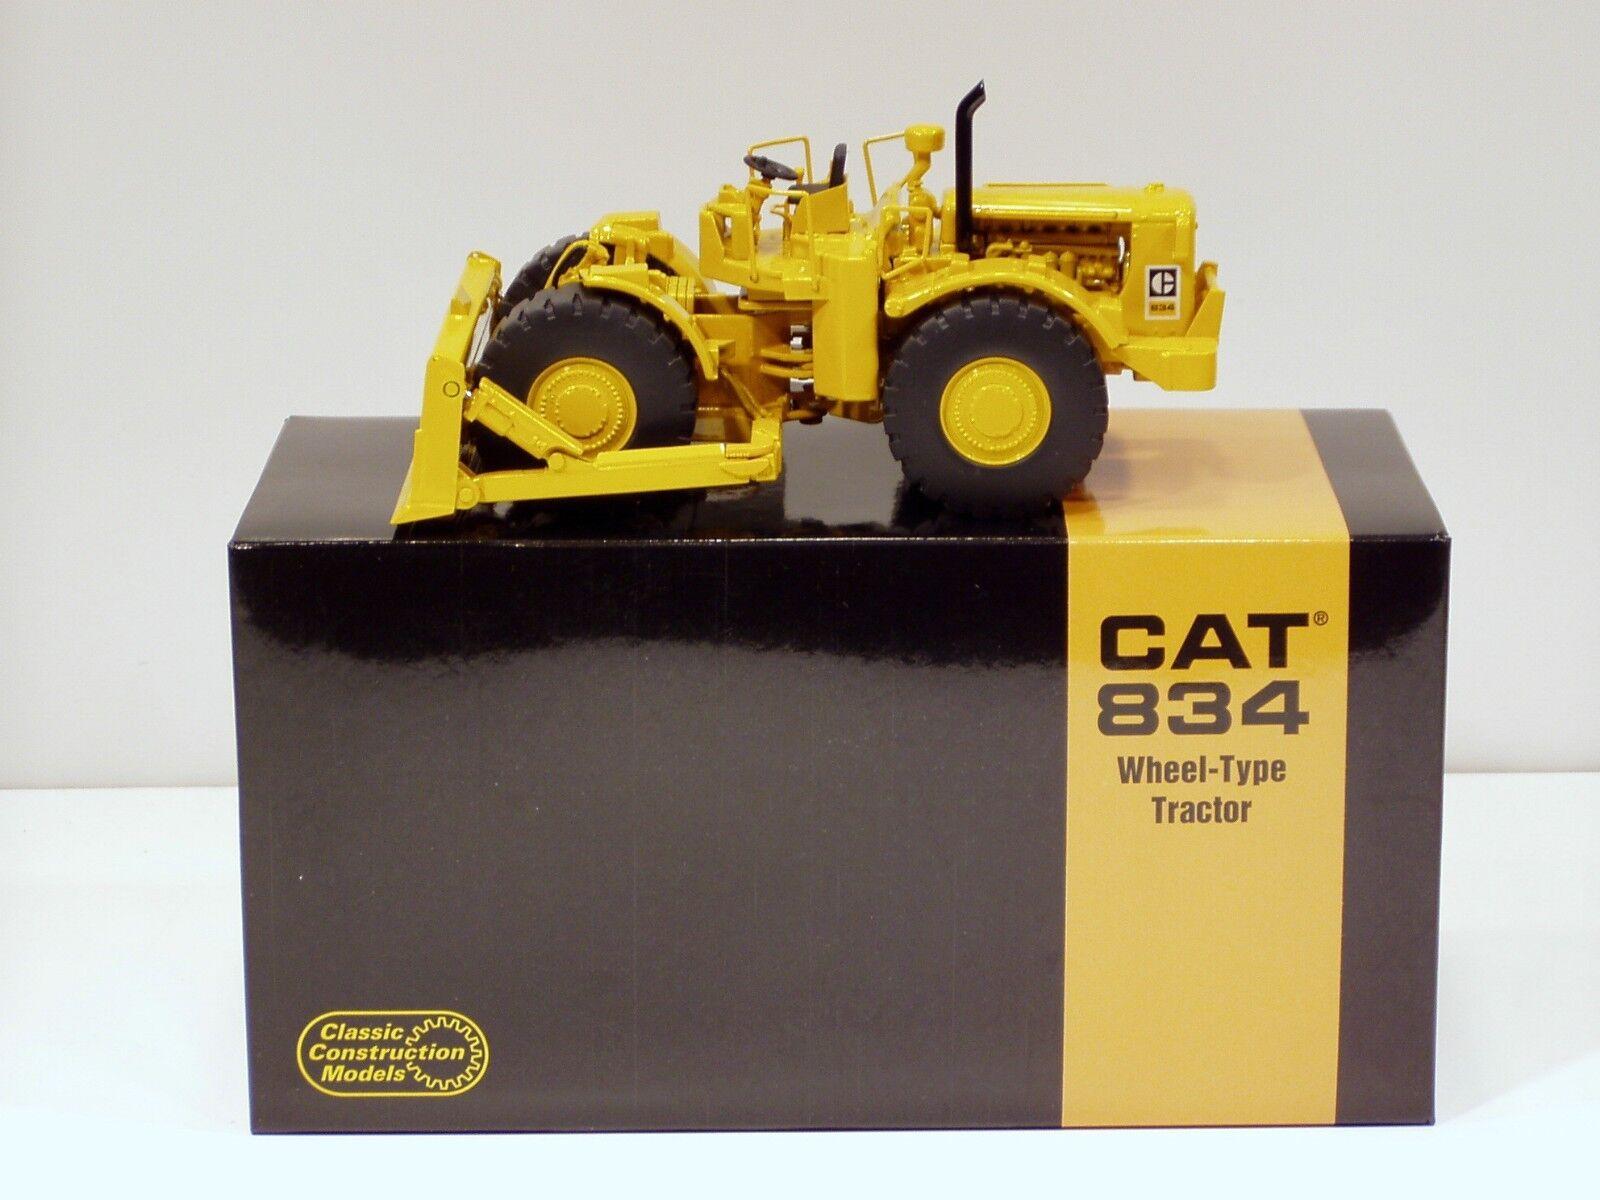 Caterpillar Caterpillar Caterpillar 834 Wheel Dozer - 1 48 - CCM - Diecast - Brand New 2010 11c398